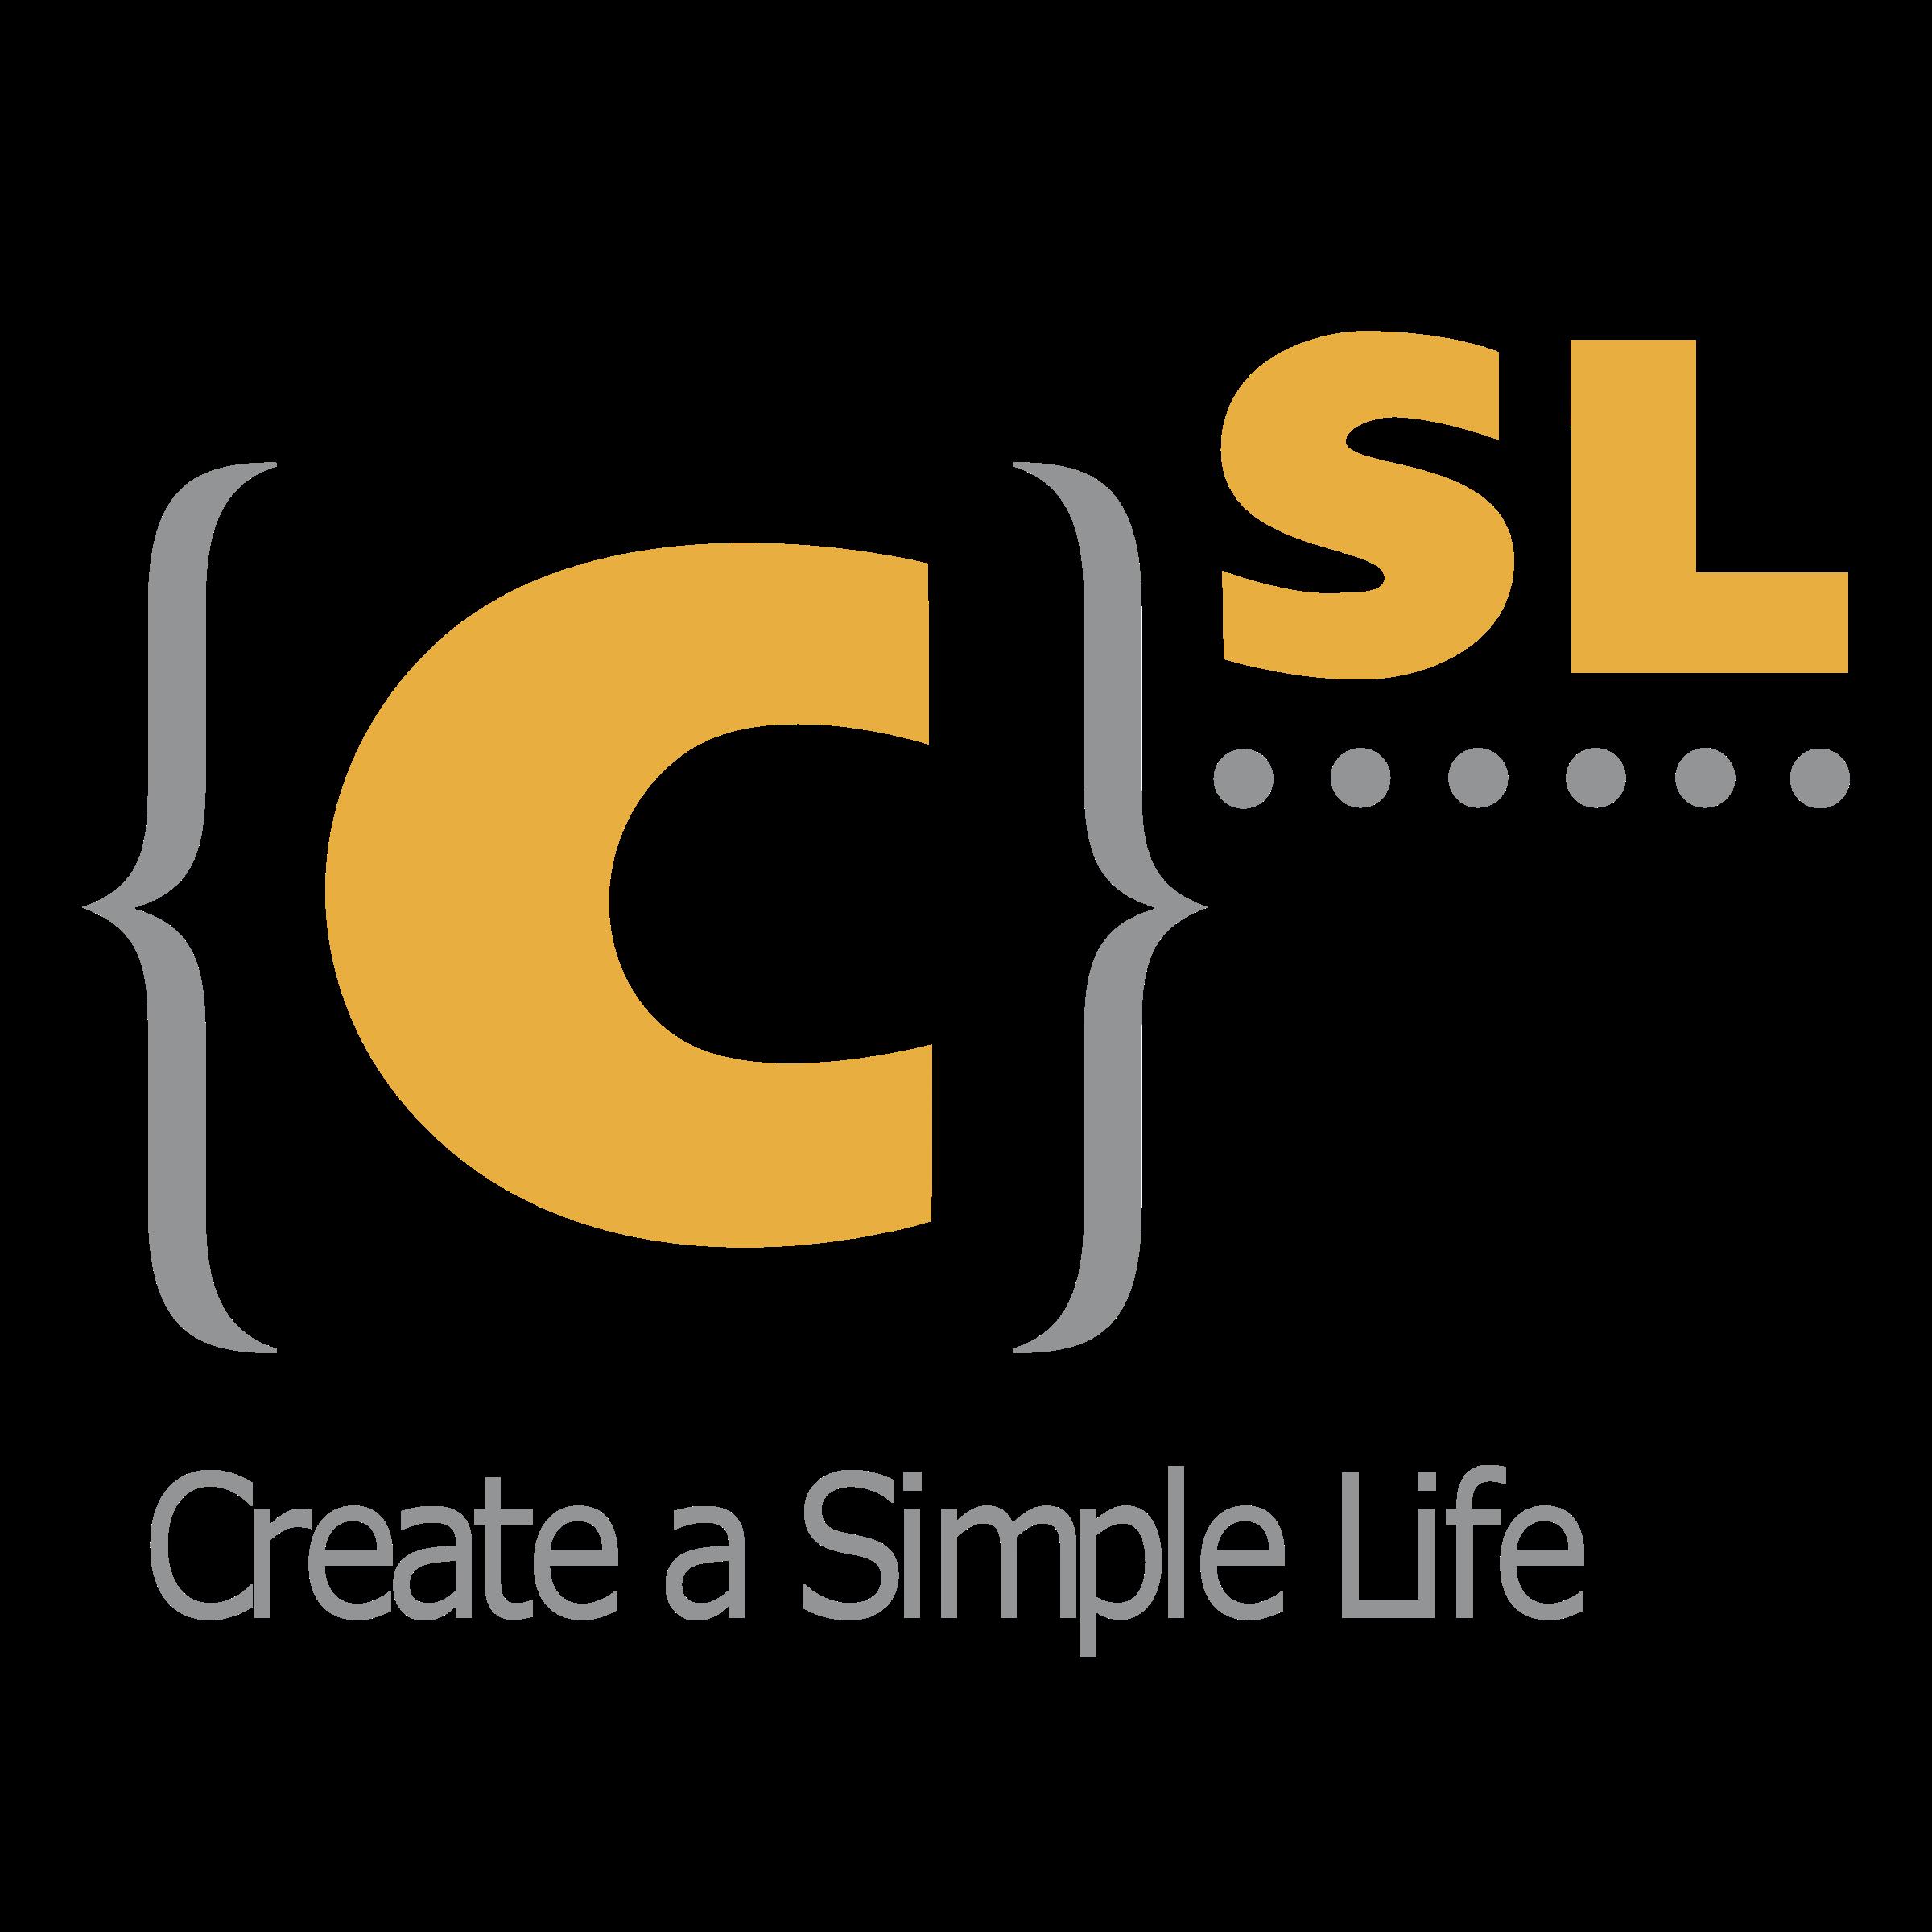 CSL Logo PNG Transparent & SVG Vector.